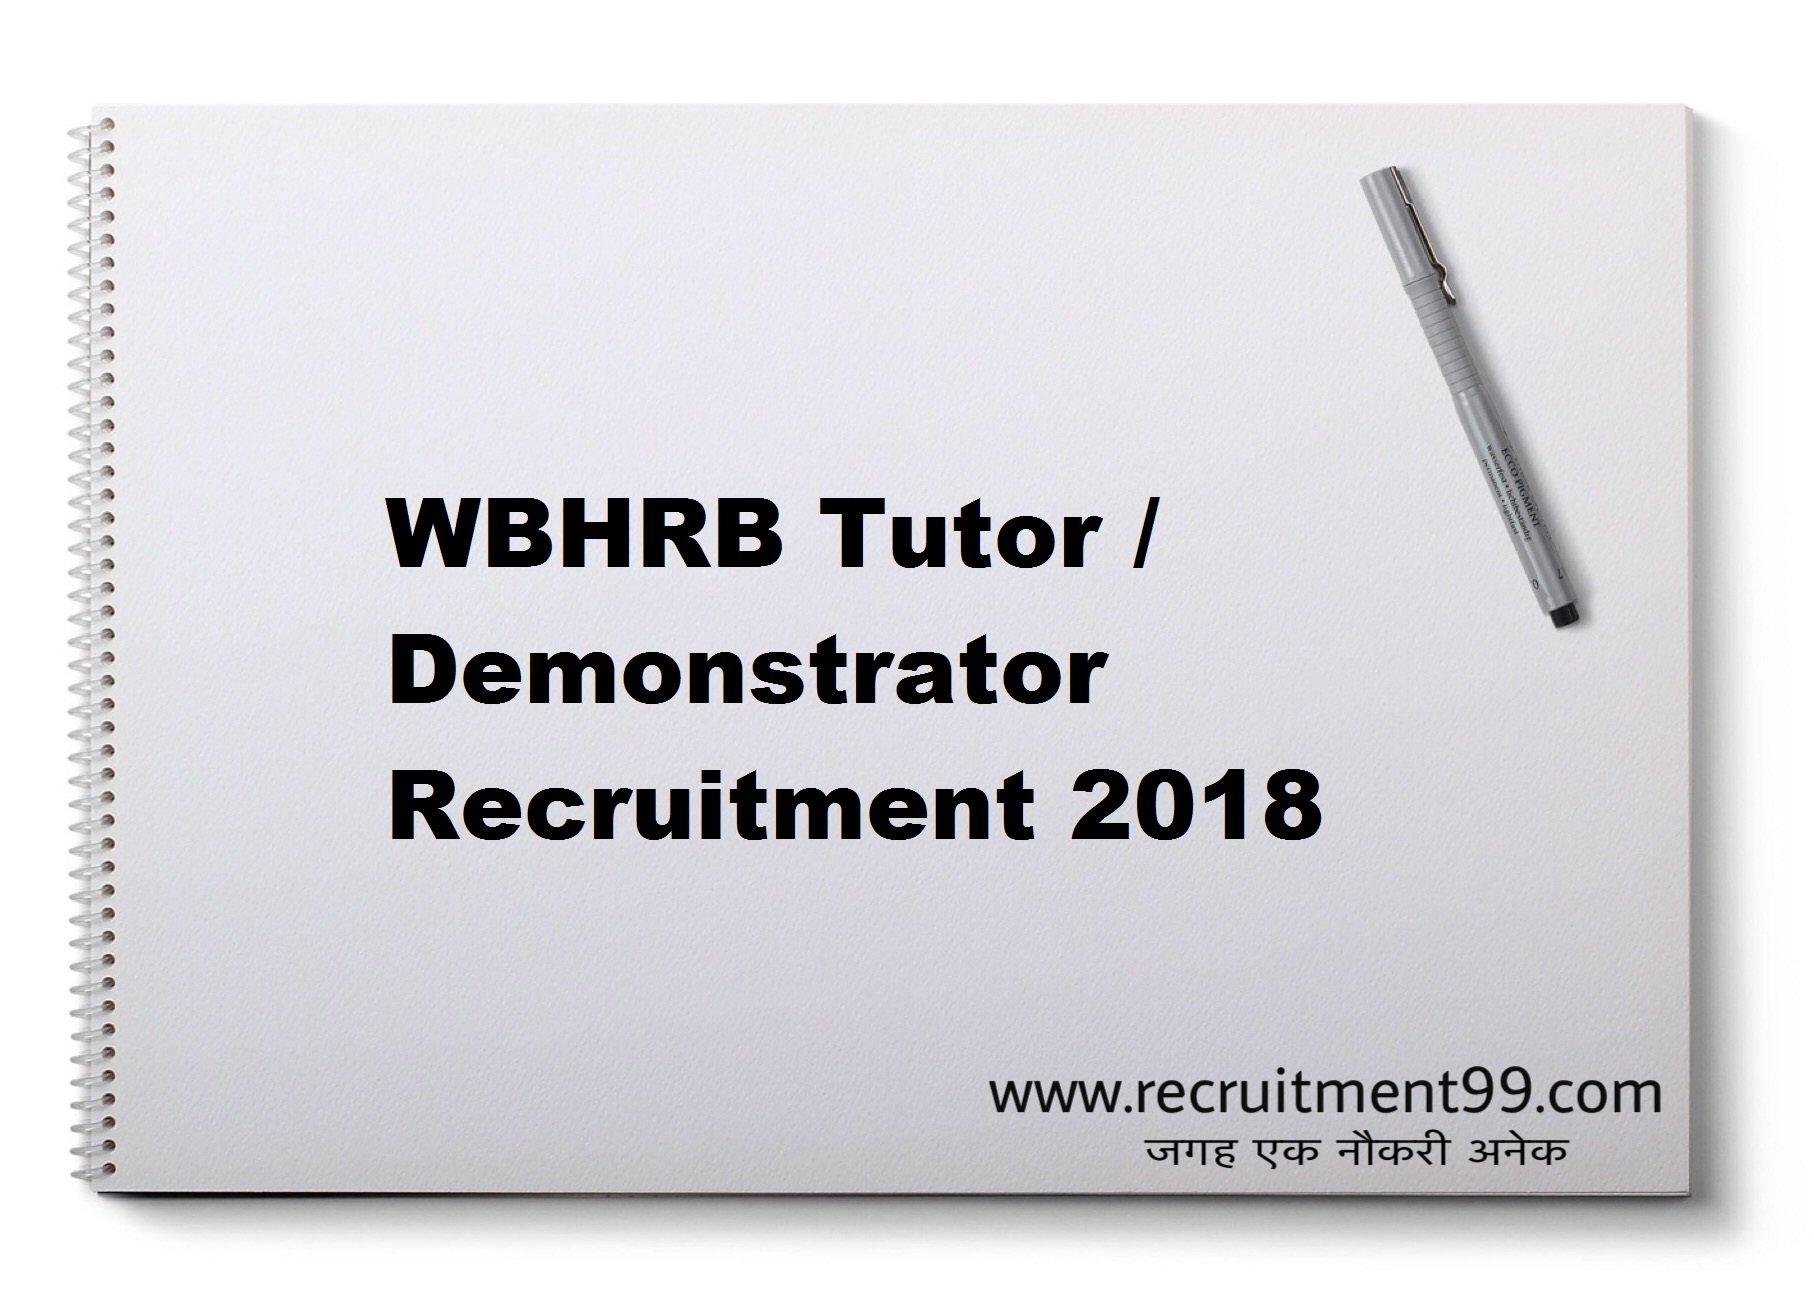 WBHRB Tutor Demonstrator Recruitment Admit Card Result 2018